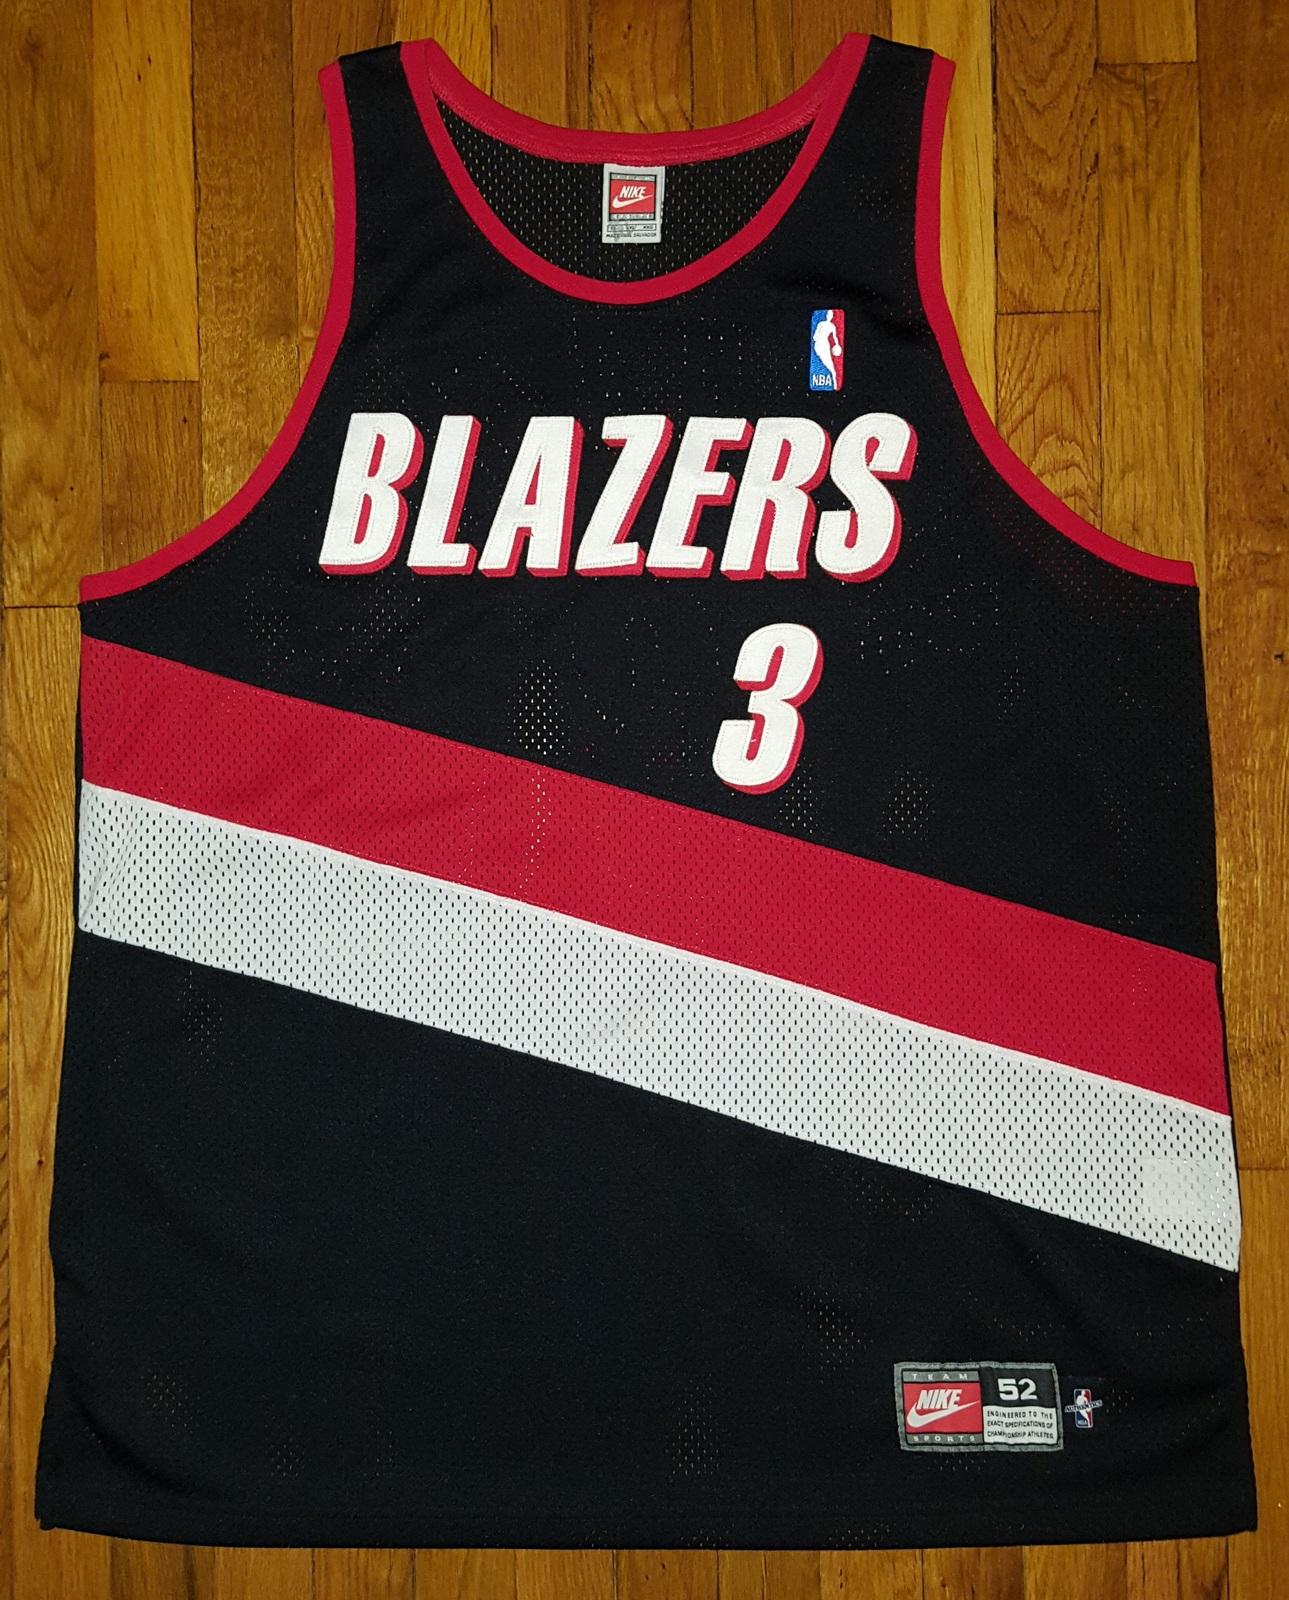 a8ea5a4ac73 20161127 200641. 20161127 200641. Previous. Authentic Nike Portland  Trailblazers Blazers Damon Stoudamire ...